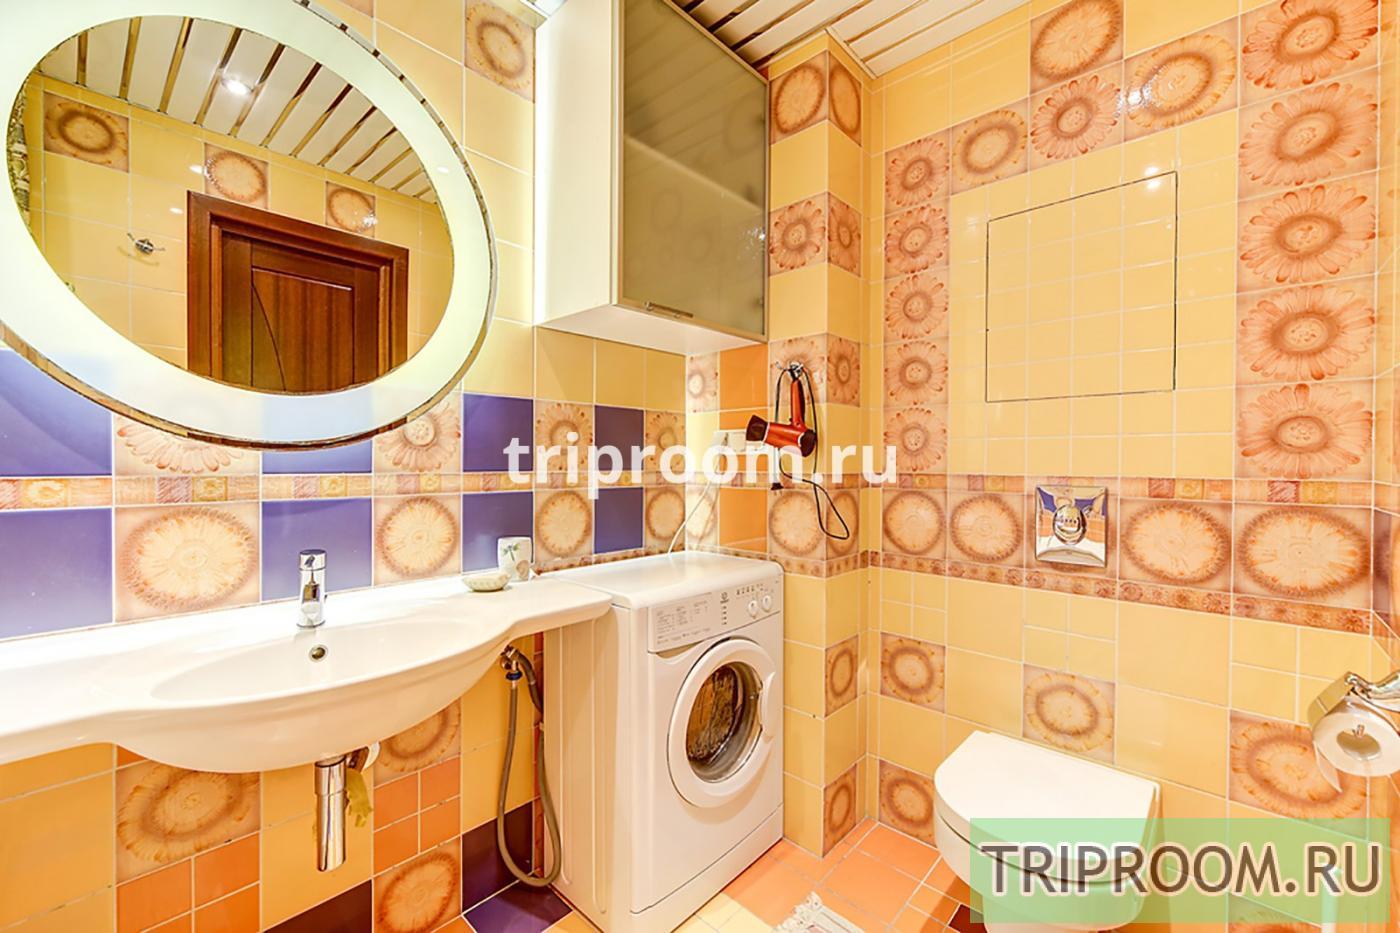 1-комнатная квартира посуточно (вариант № 15527), ул. Канала Грибоедова набережная, фото № 16